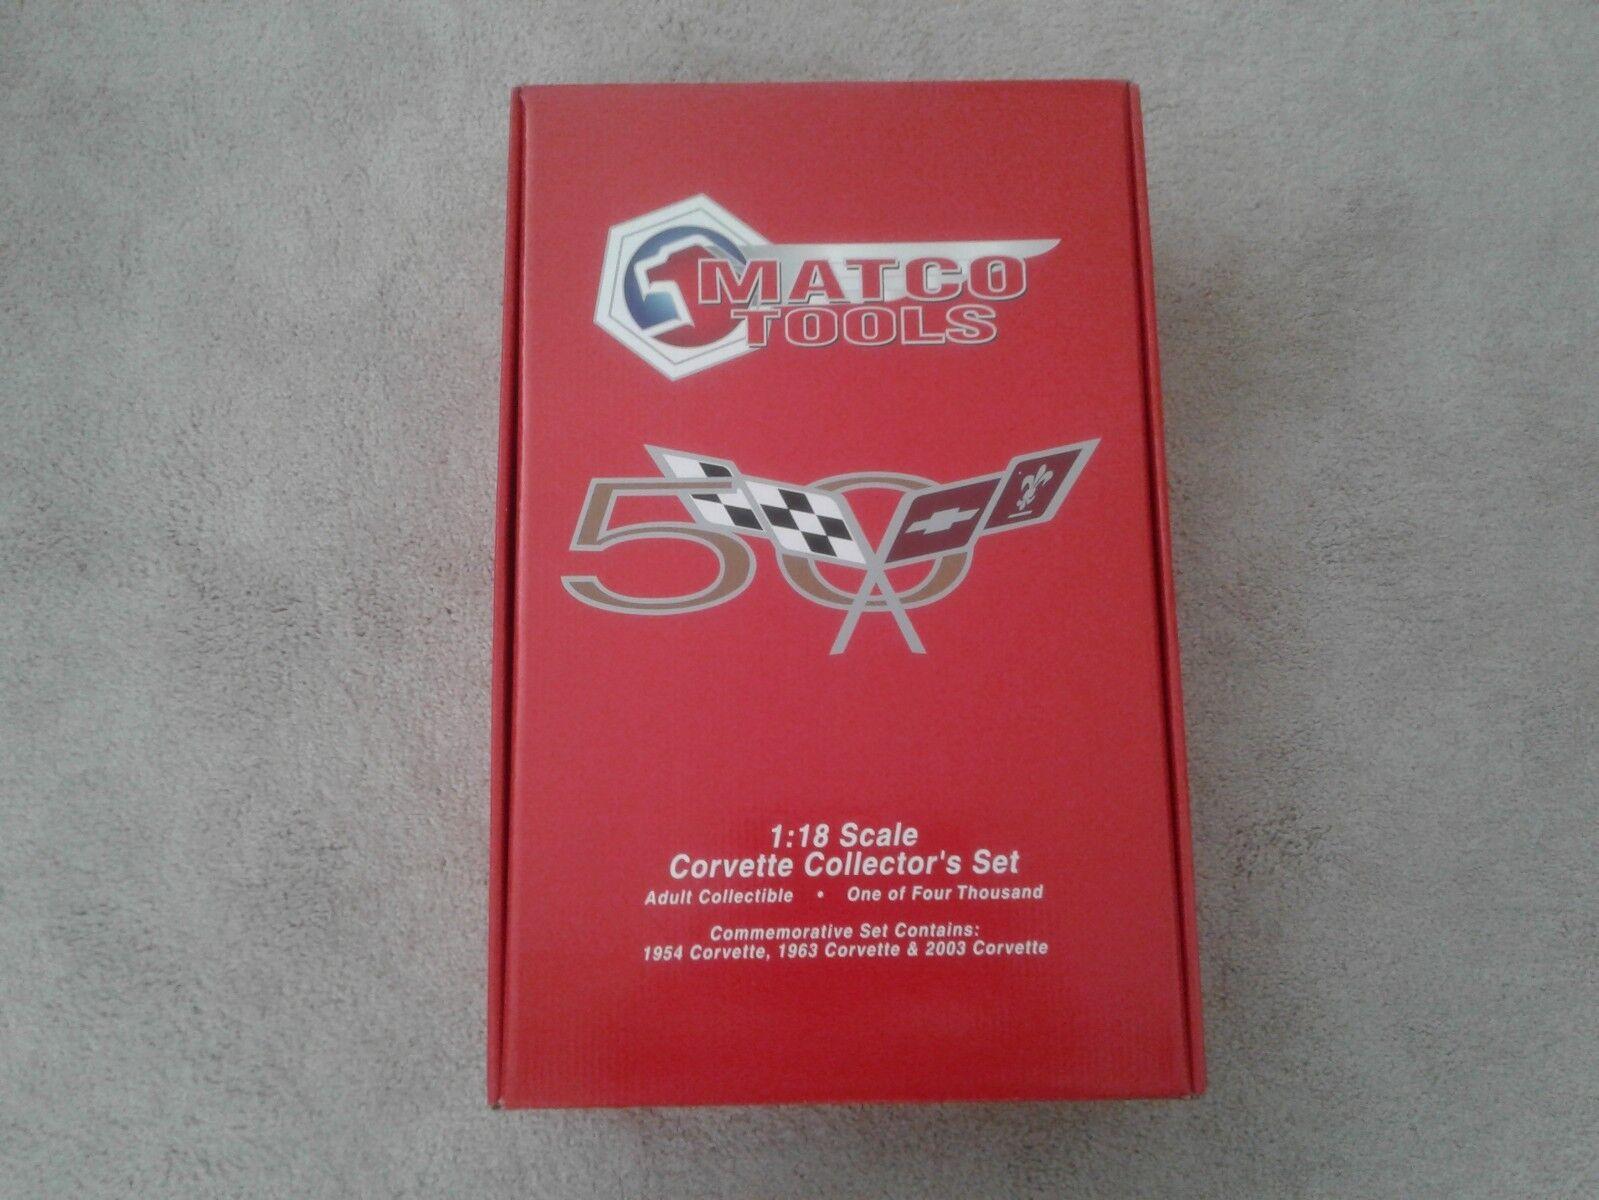 MATCO TOOLS CORVETTE Set 1954, 1963, & 2003 Racing Champions échelle 1 18